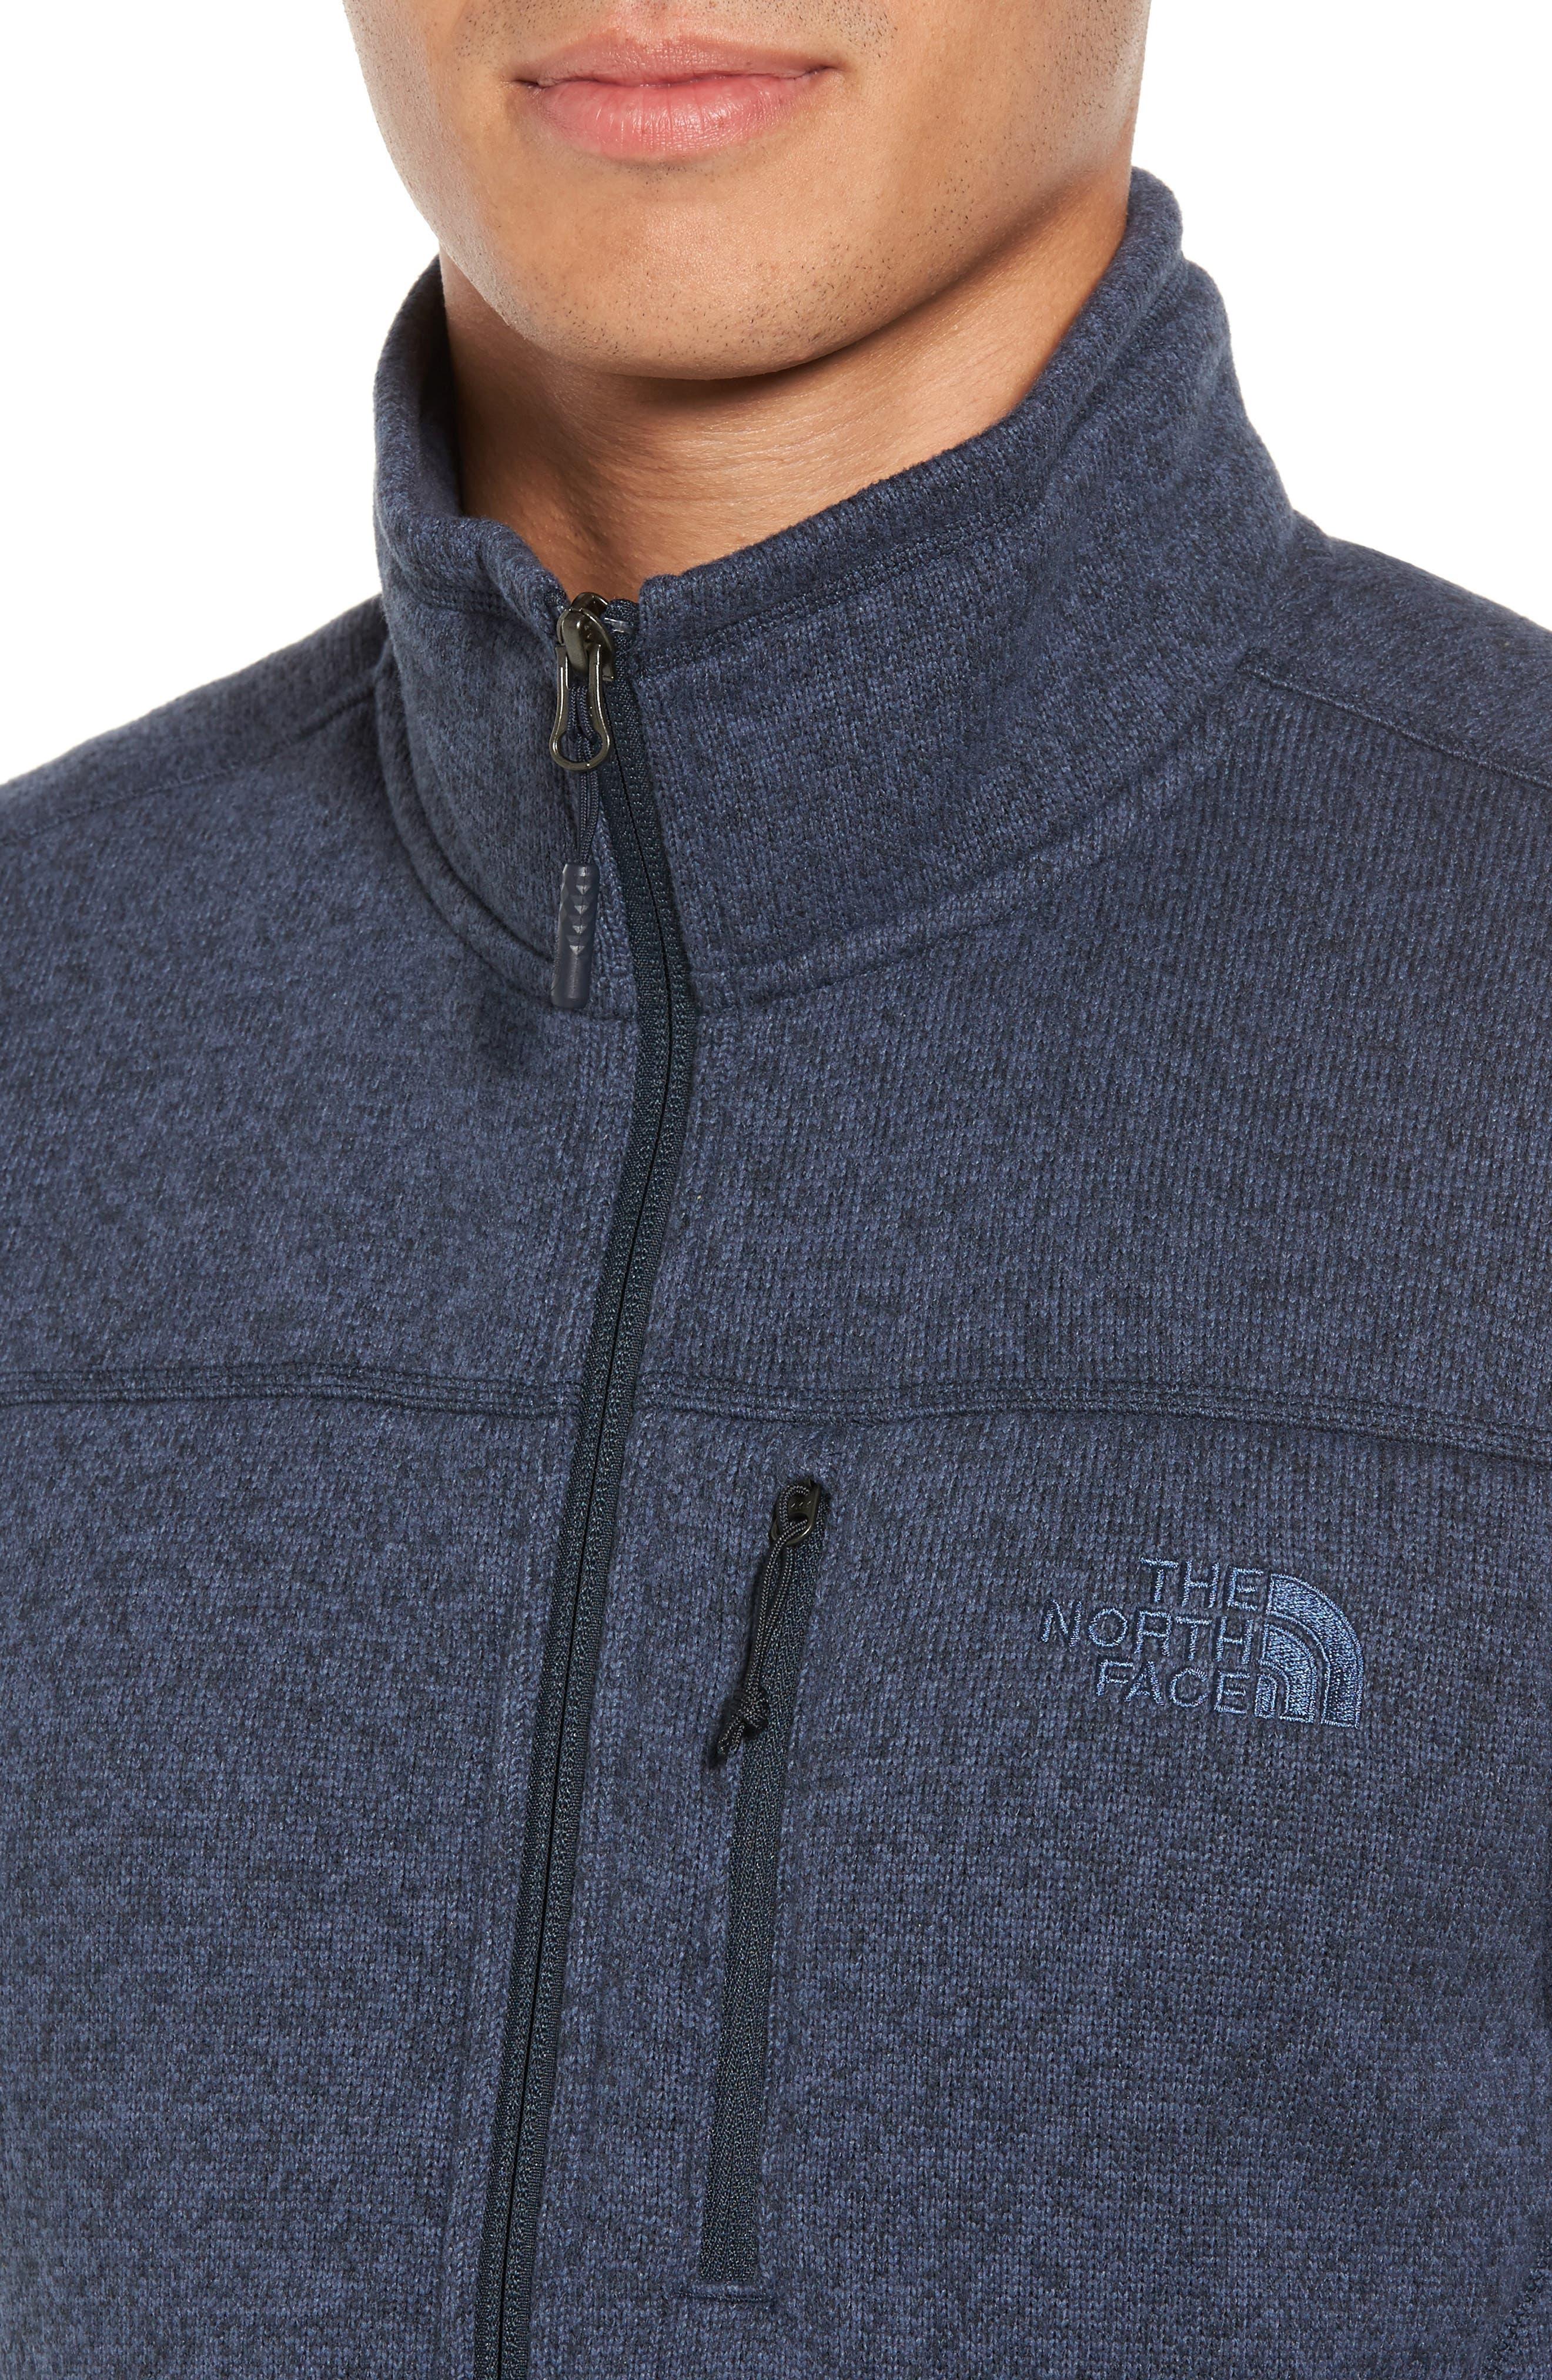 Gordon Lyons Zip Fleece Vest,                             Alternate thumbnail 20, color,